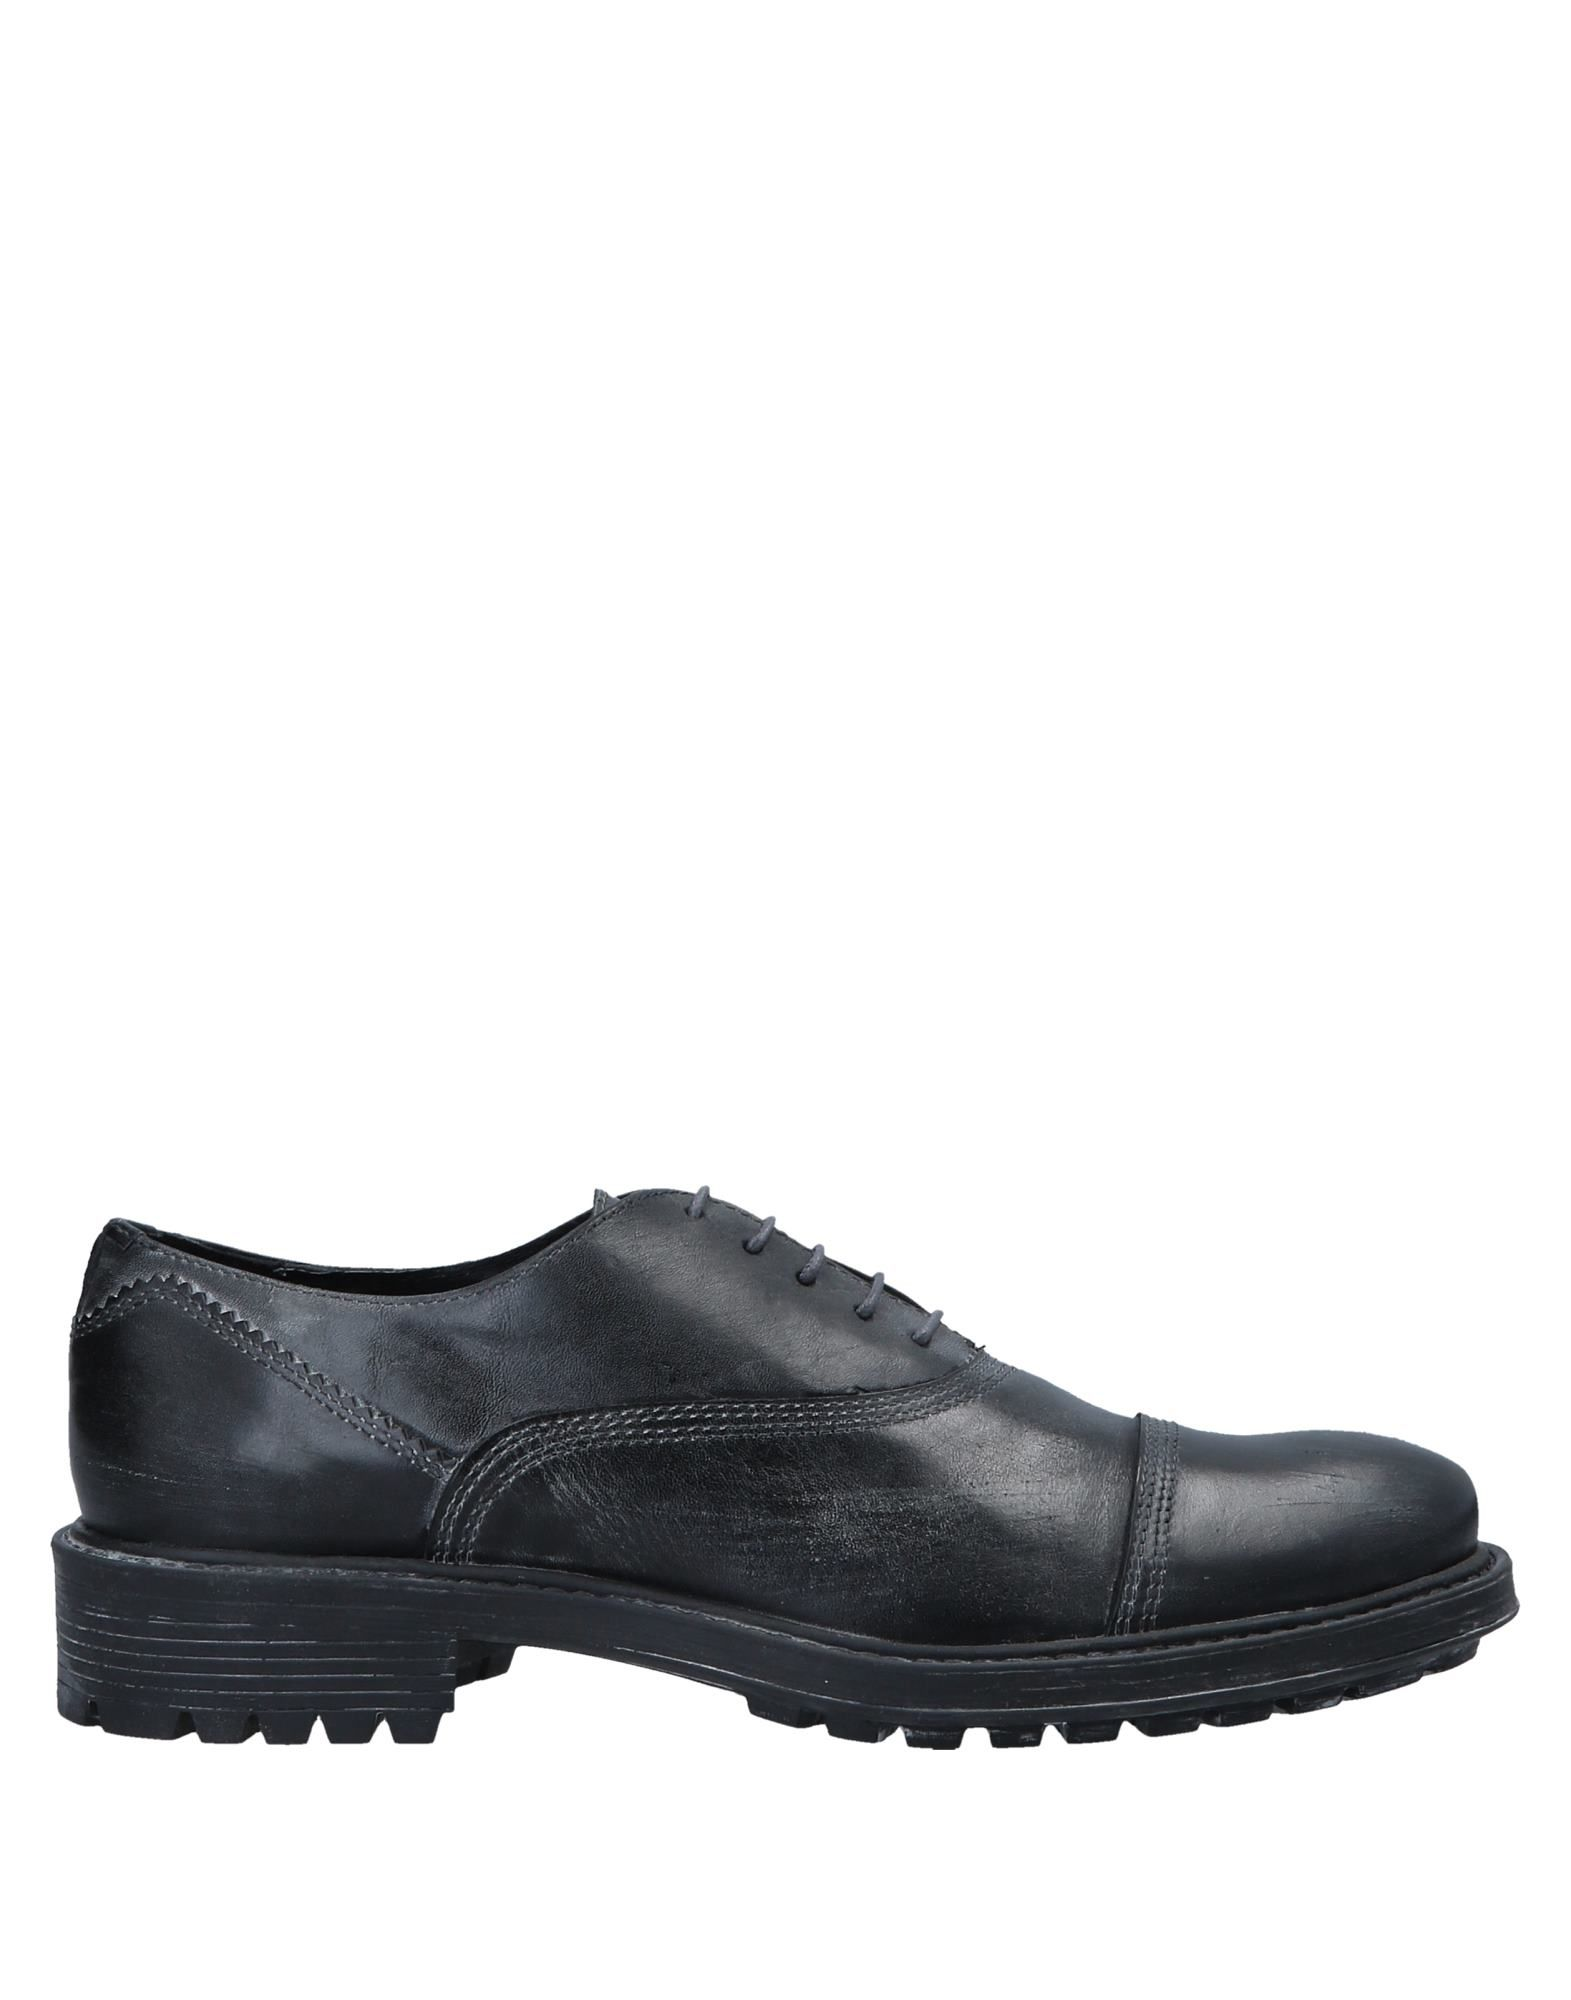 TDL COLLECTION Обувь на шнурках for 55ex710 logic board tdl c4lv0 4 screen lty550hj02 90 days warranty